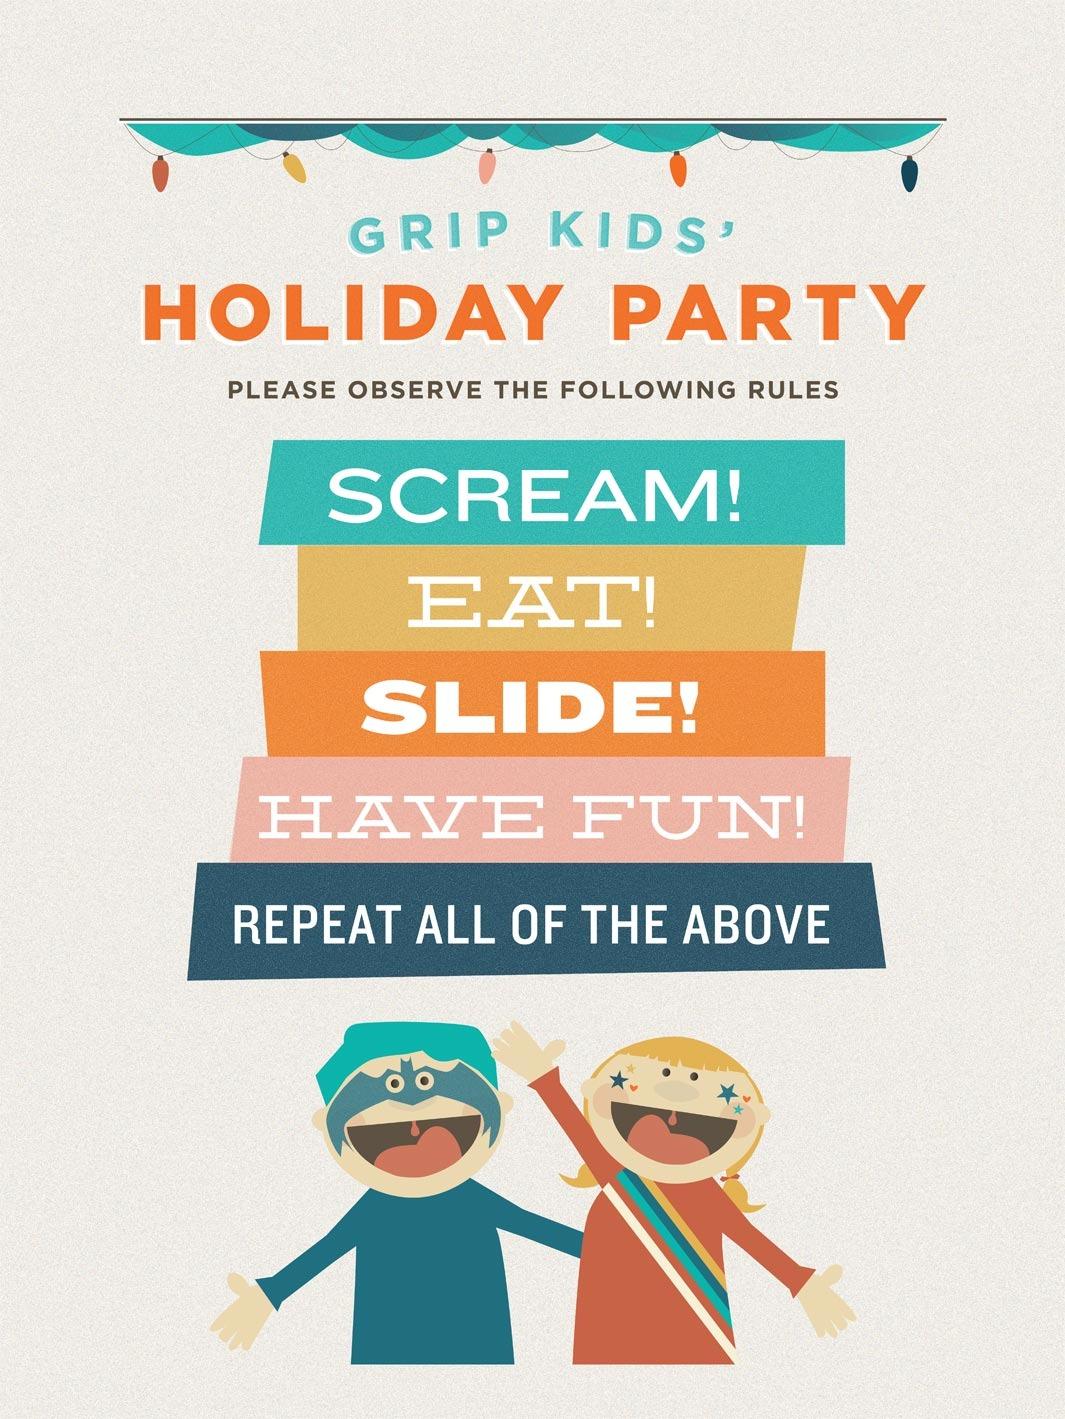 grip kids holiday party nancy ng art direction amp design